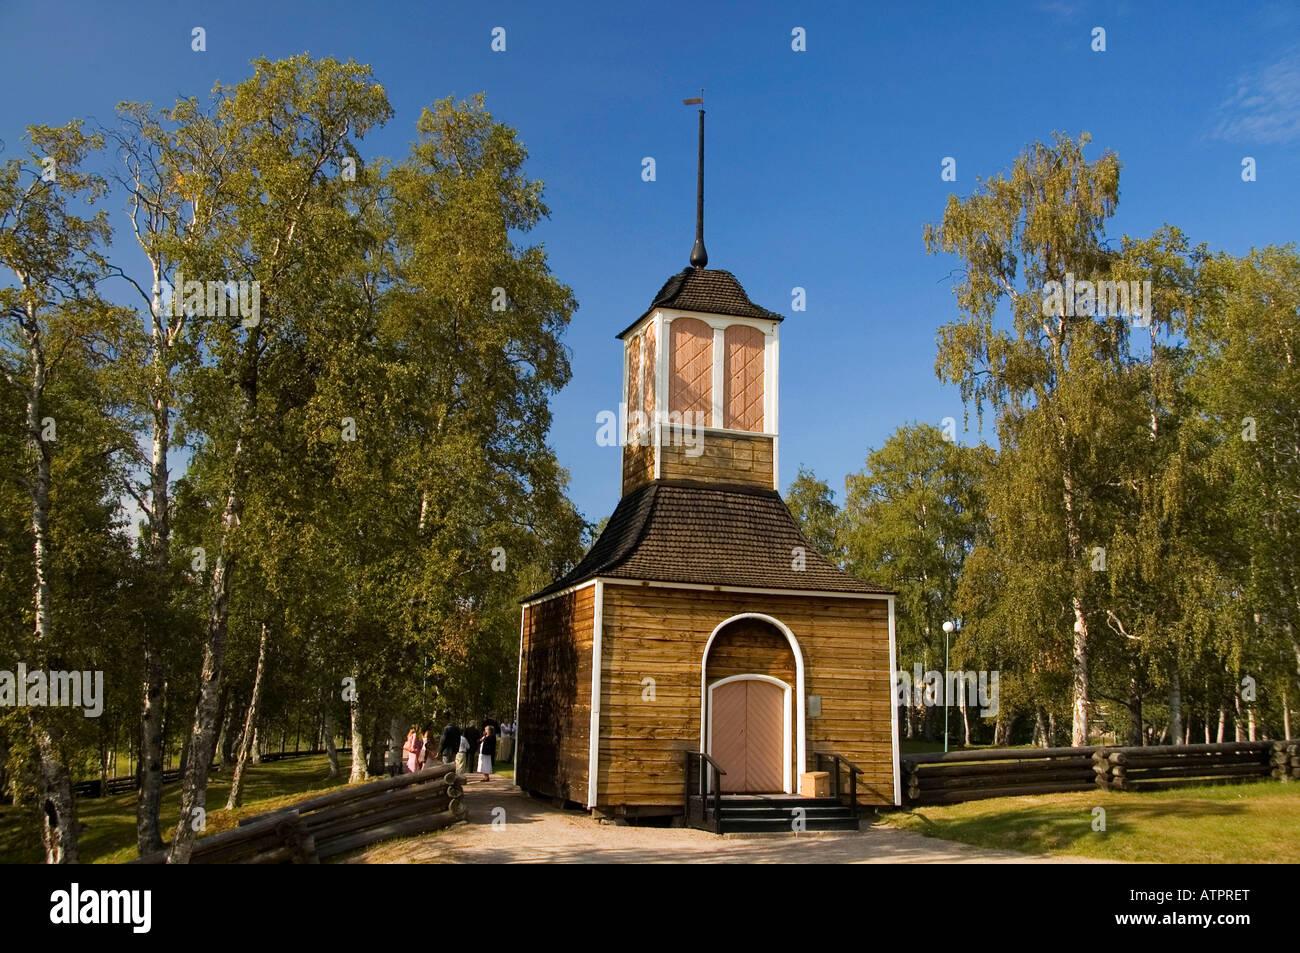 Church / Gallivare - Stock Image